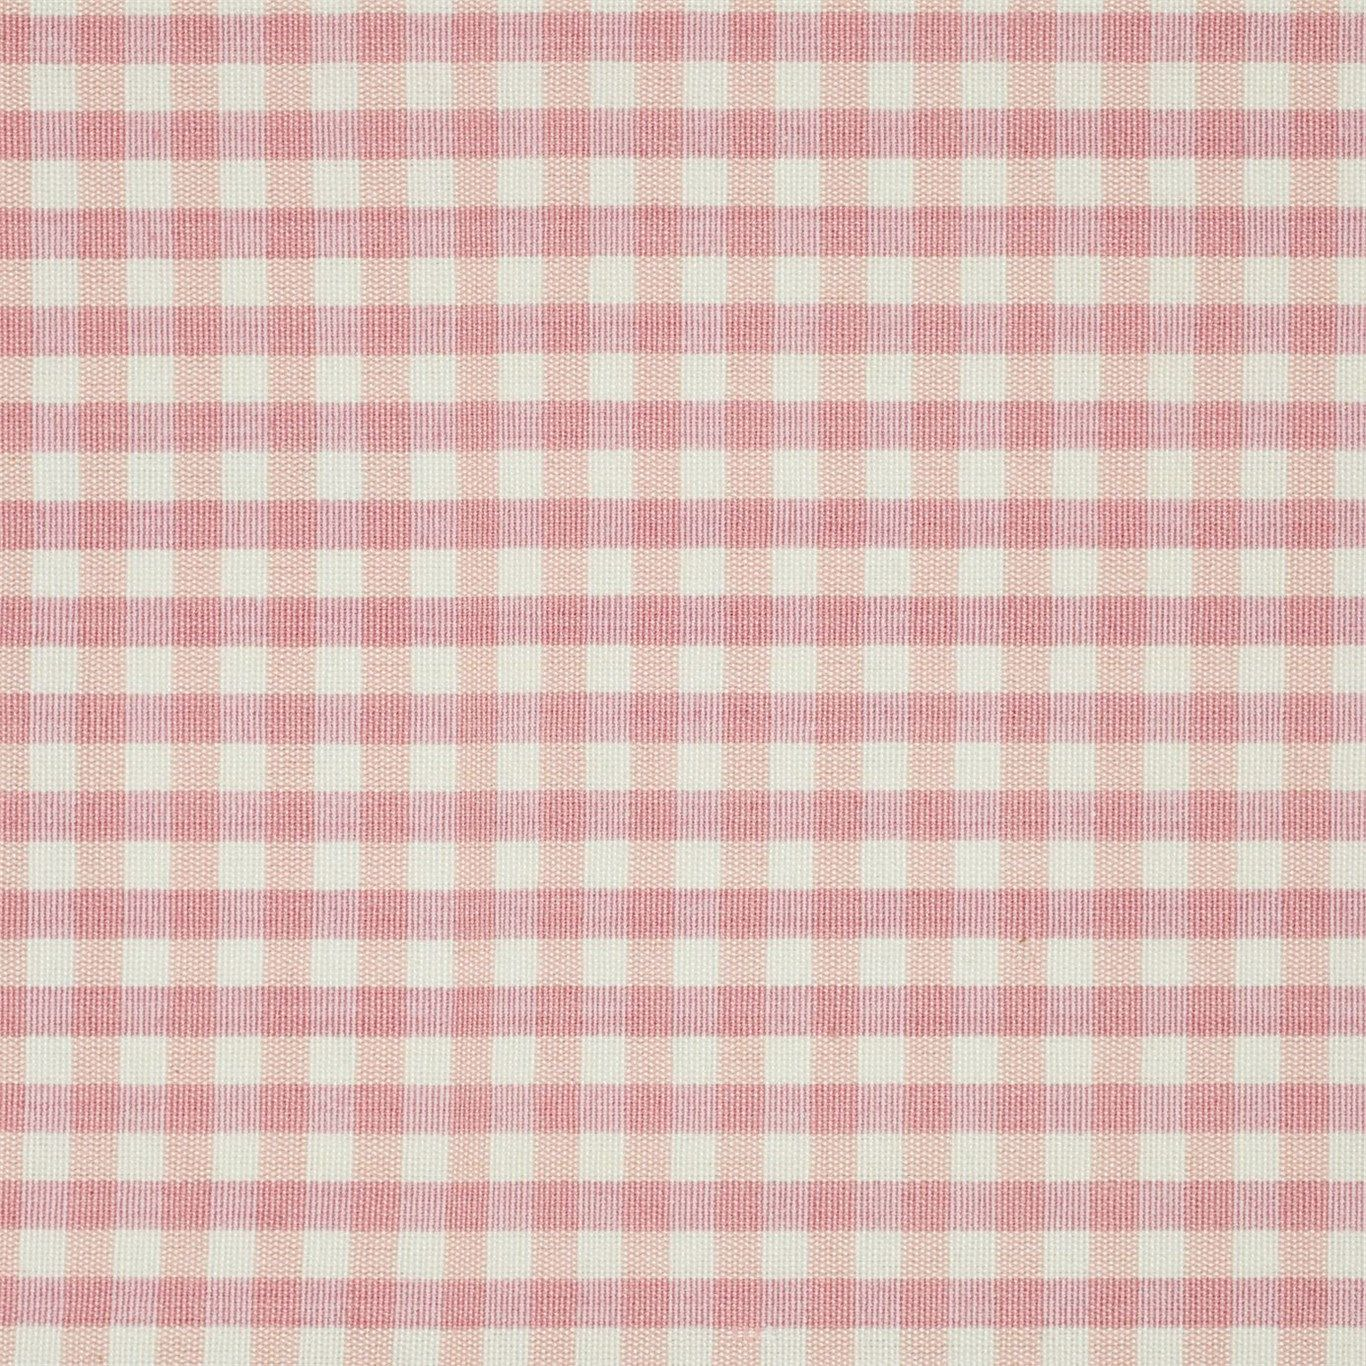 Harlequin bonbon lollipop fabric